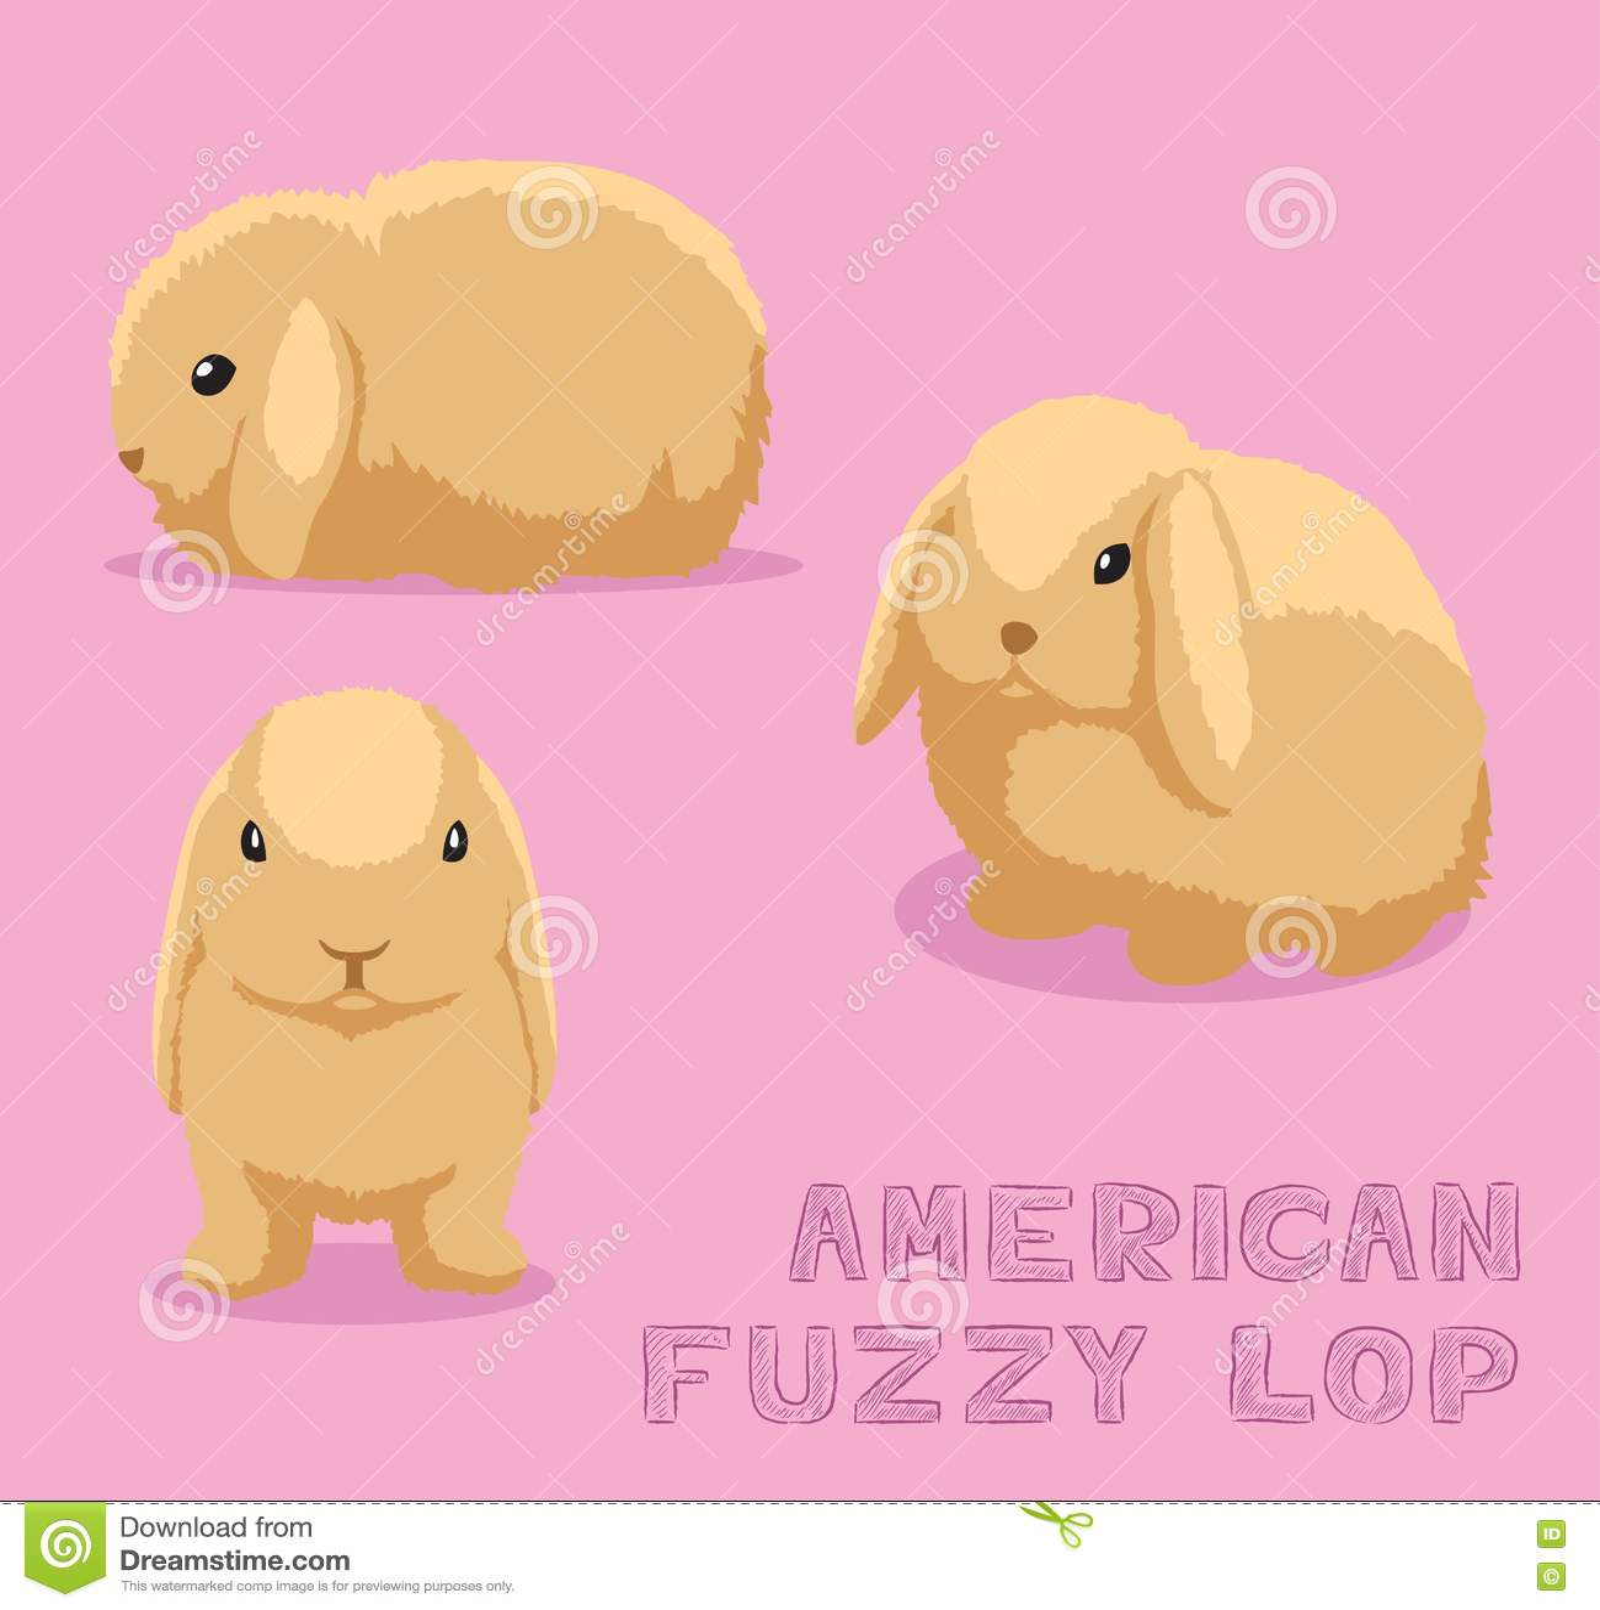 American Fuzzy Lop Rabbit Stock Illustrations 9 American